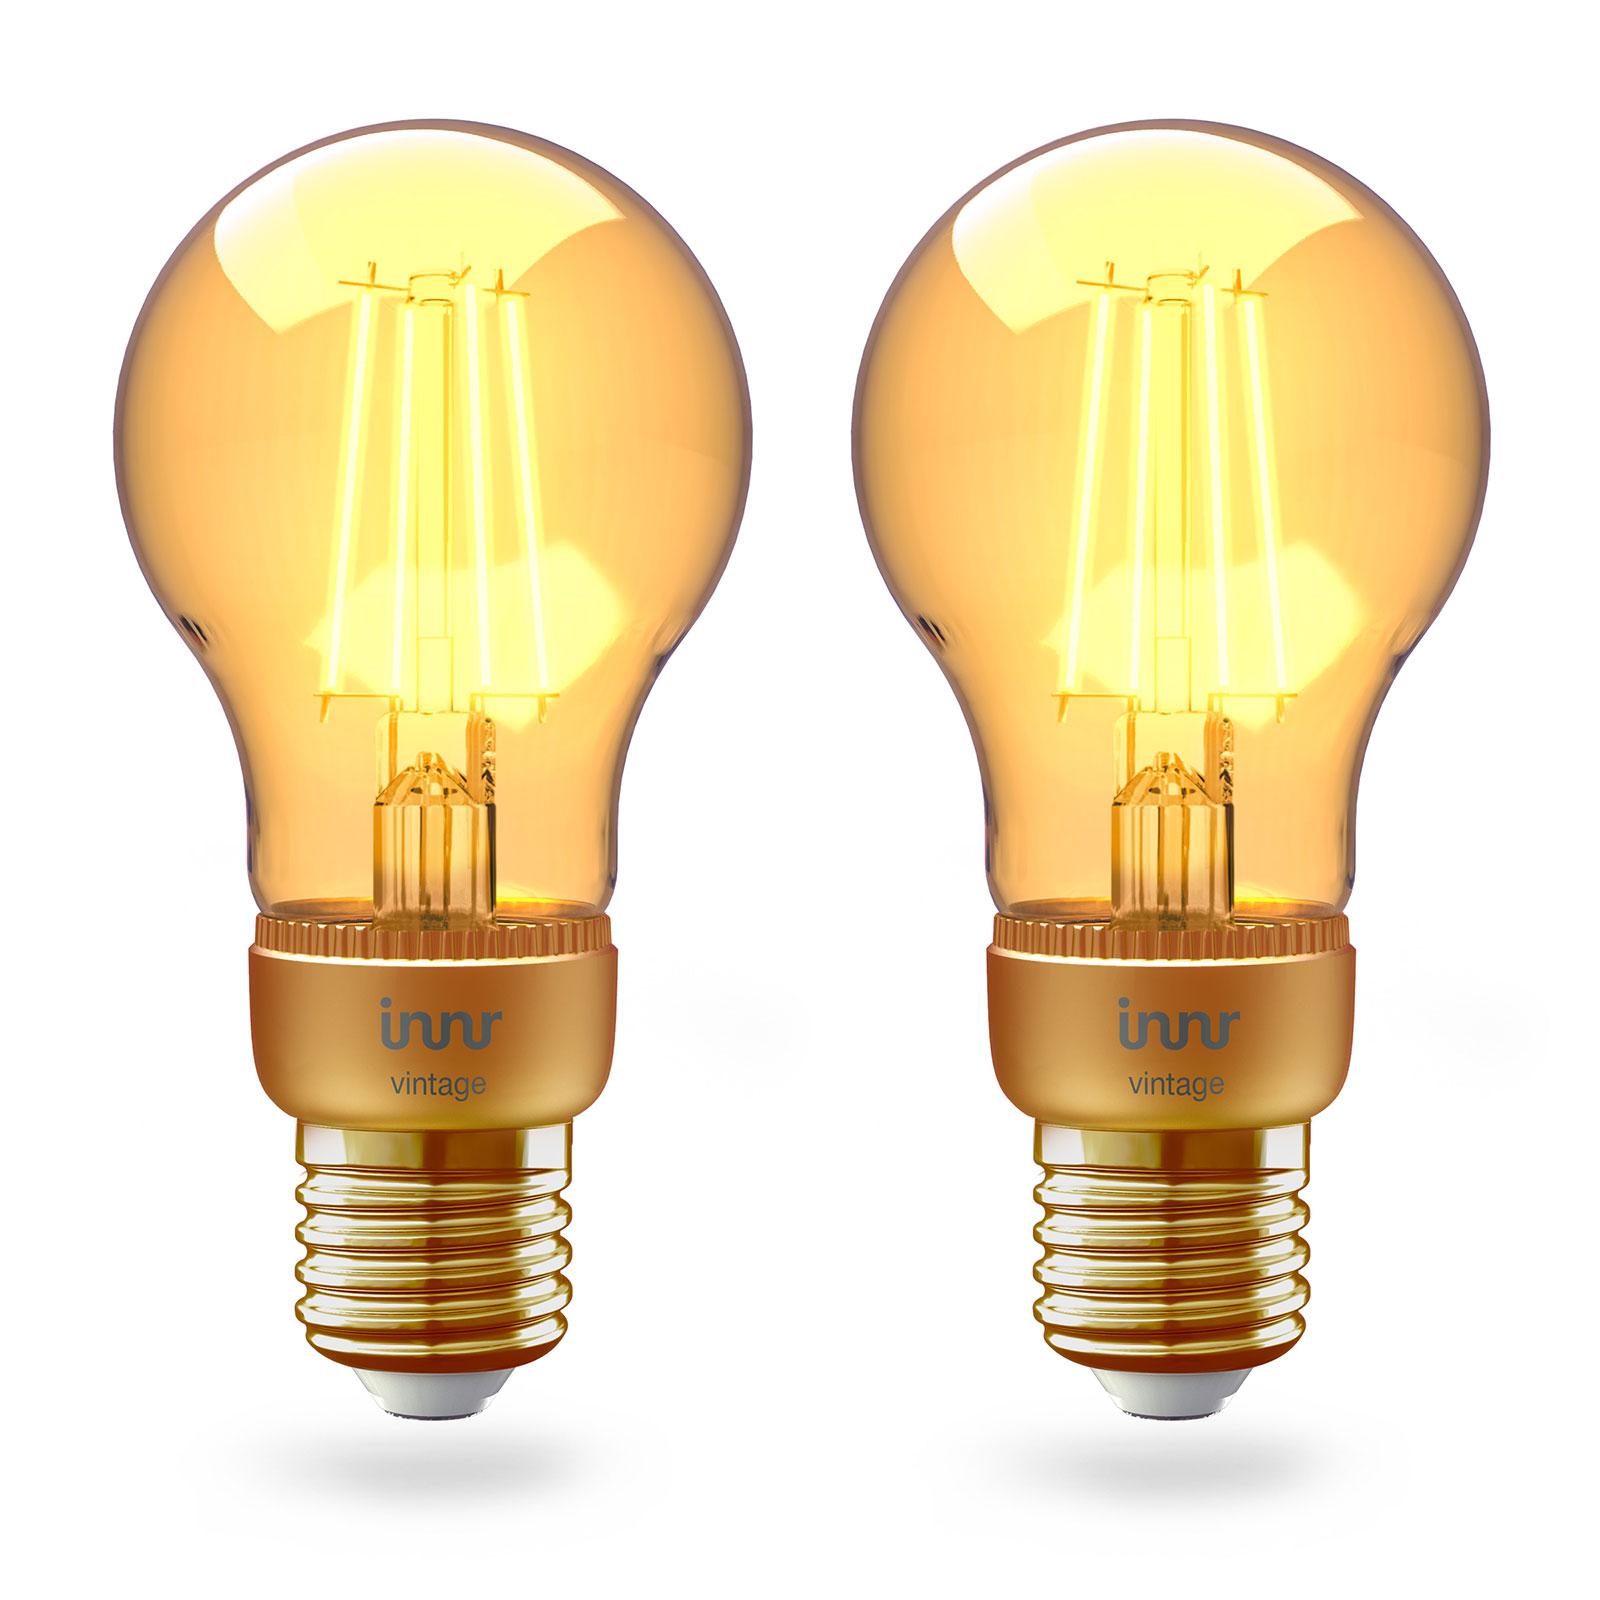 Innr LED E27 4,2W Smart Filament warmweiß gold 2er